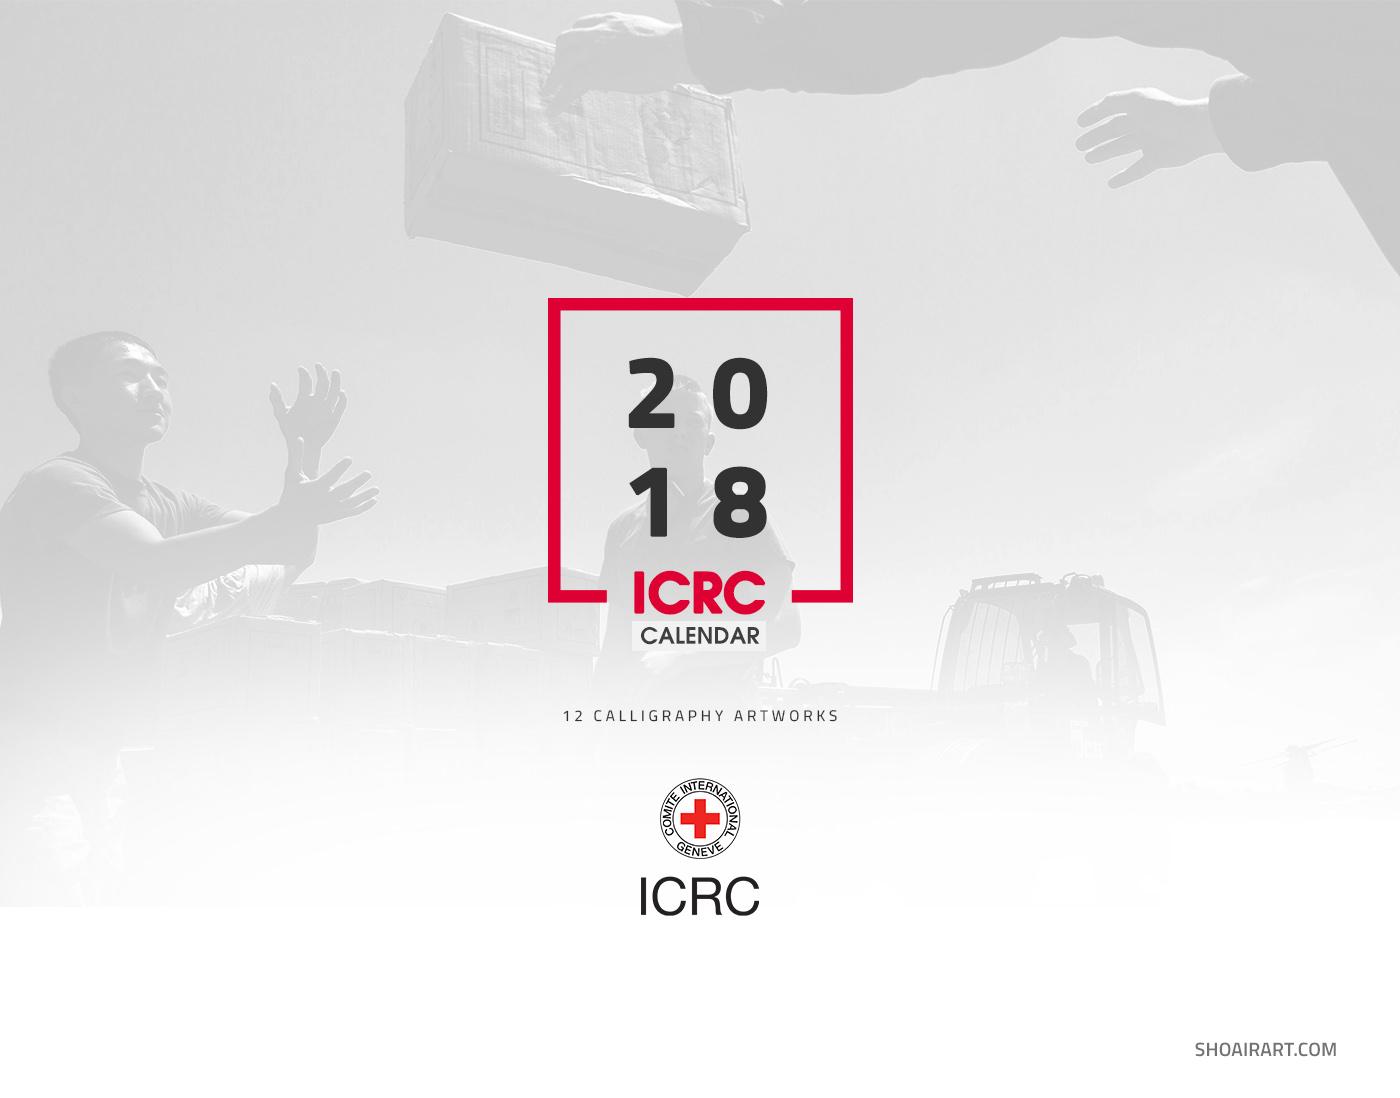 ICRC Calendar 2018